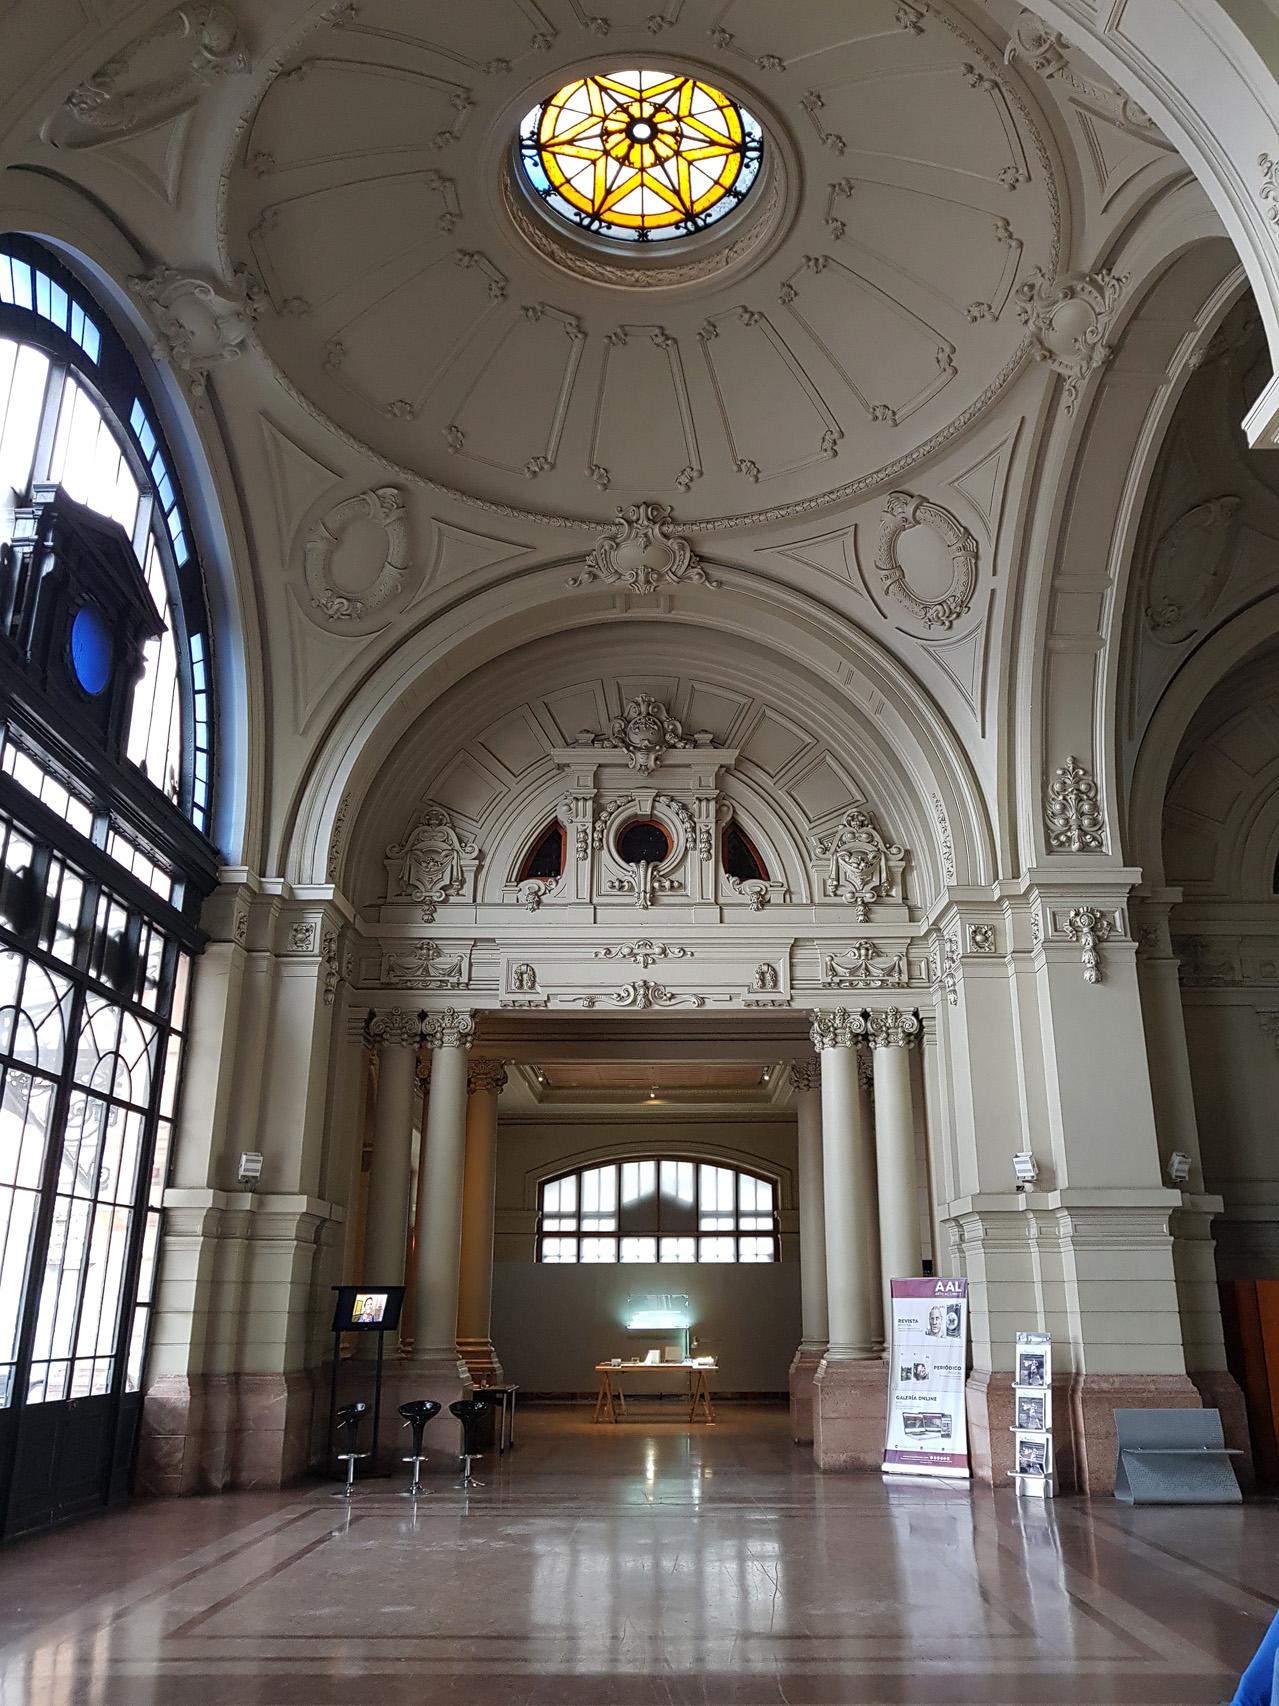 Estacion Mapocho, früherer Bahnhof in Santiago, heute Kulturzentrum und nationales Denkmal Chiles